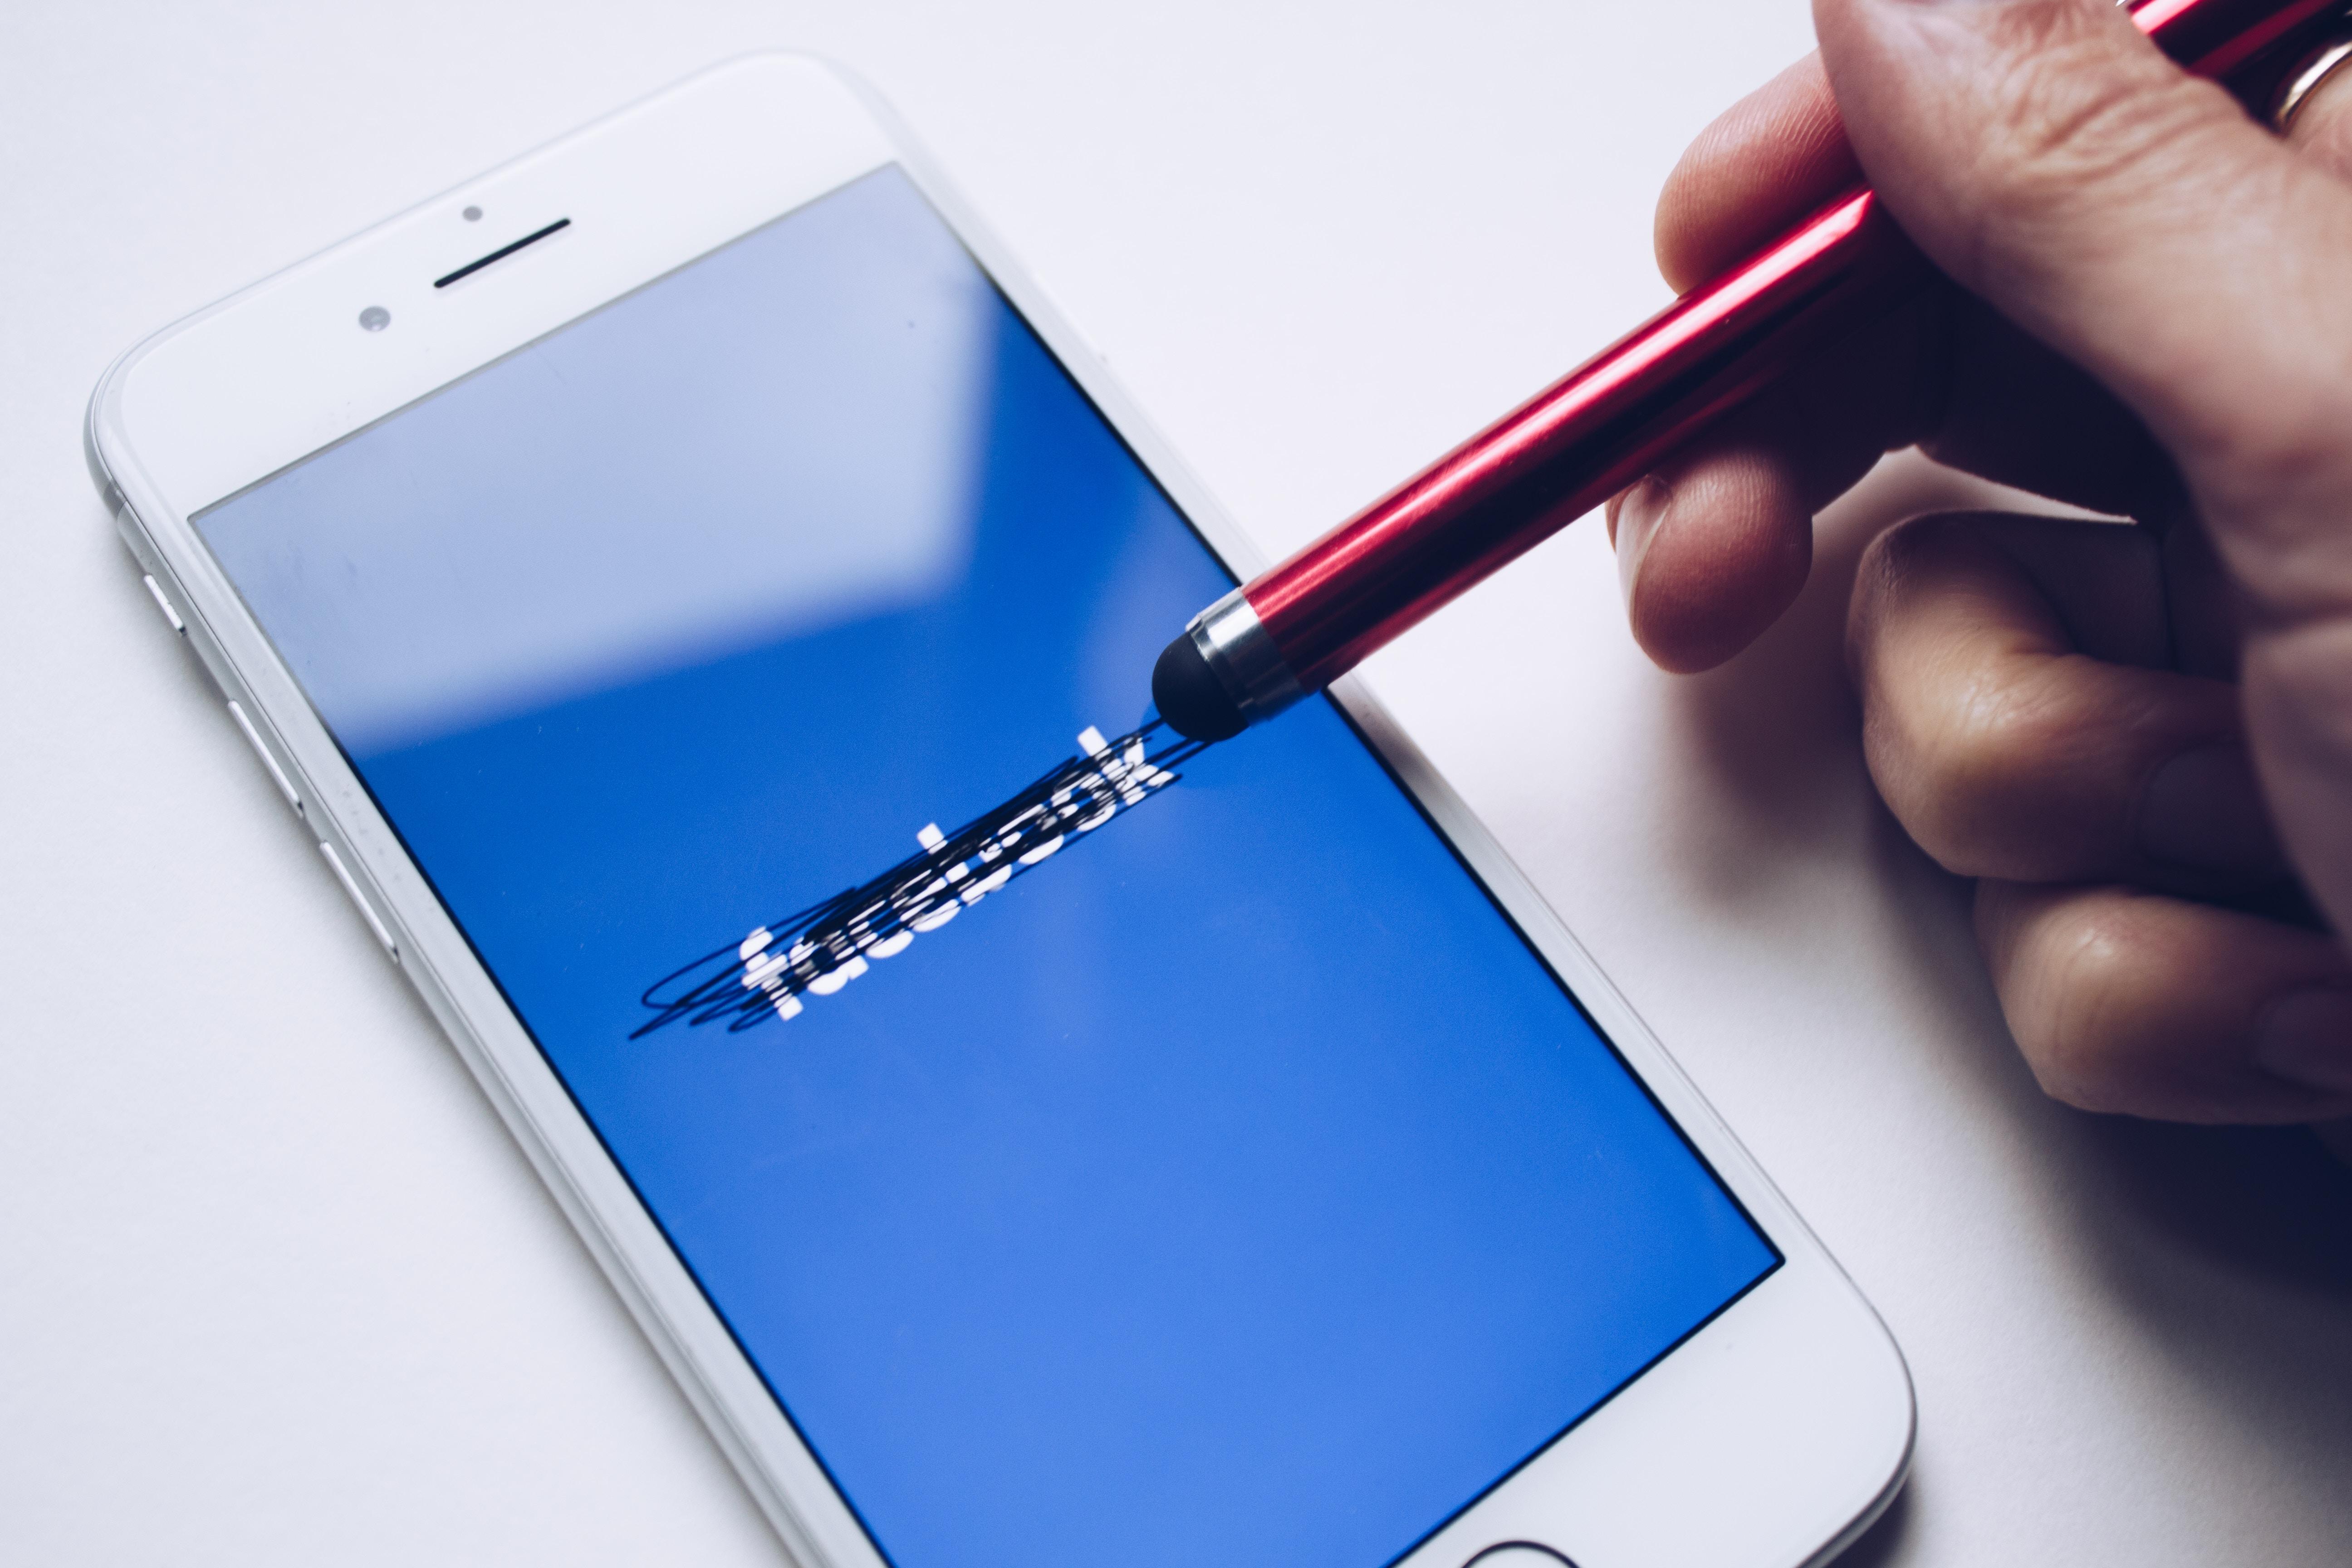 aktuelle Social Media Trends 2019: Facebook löschen